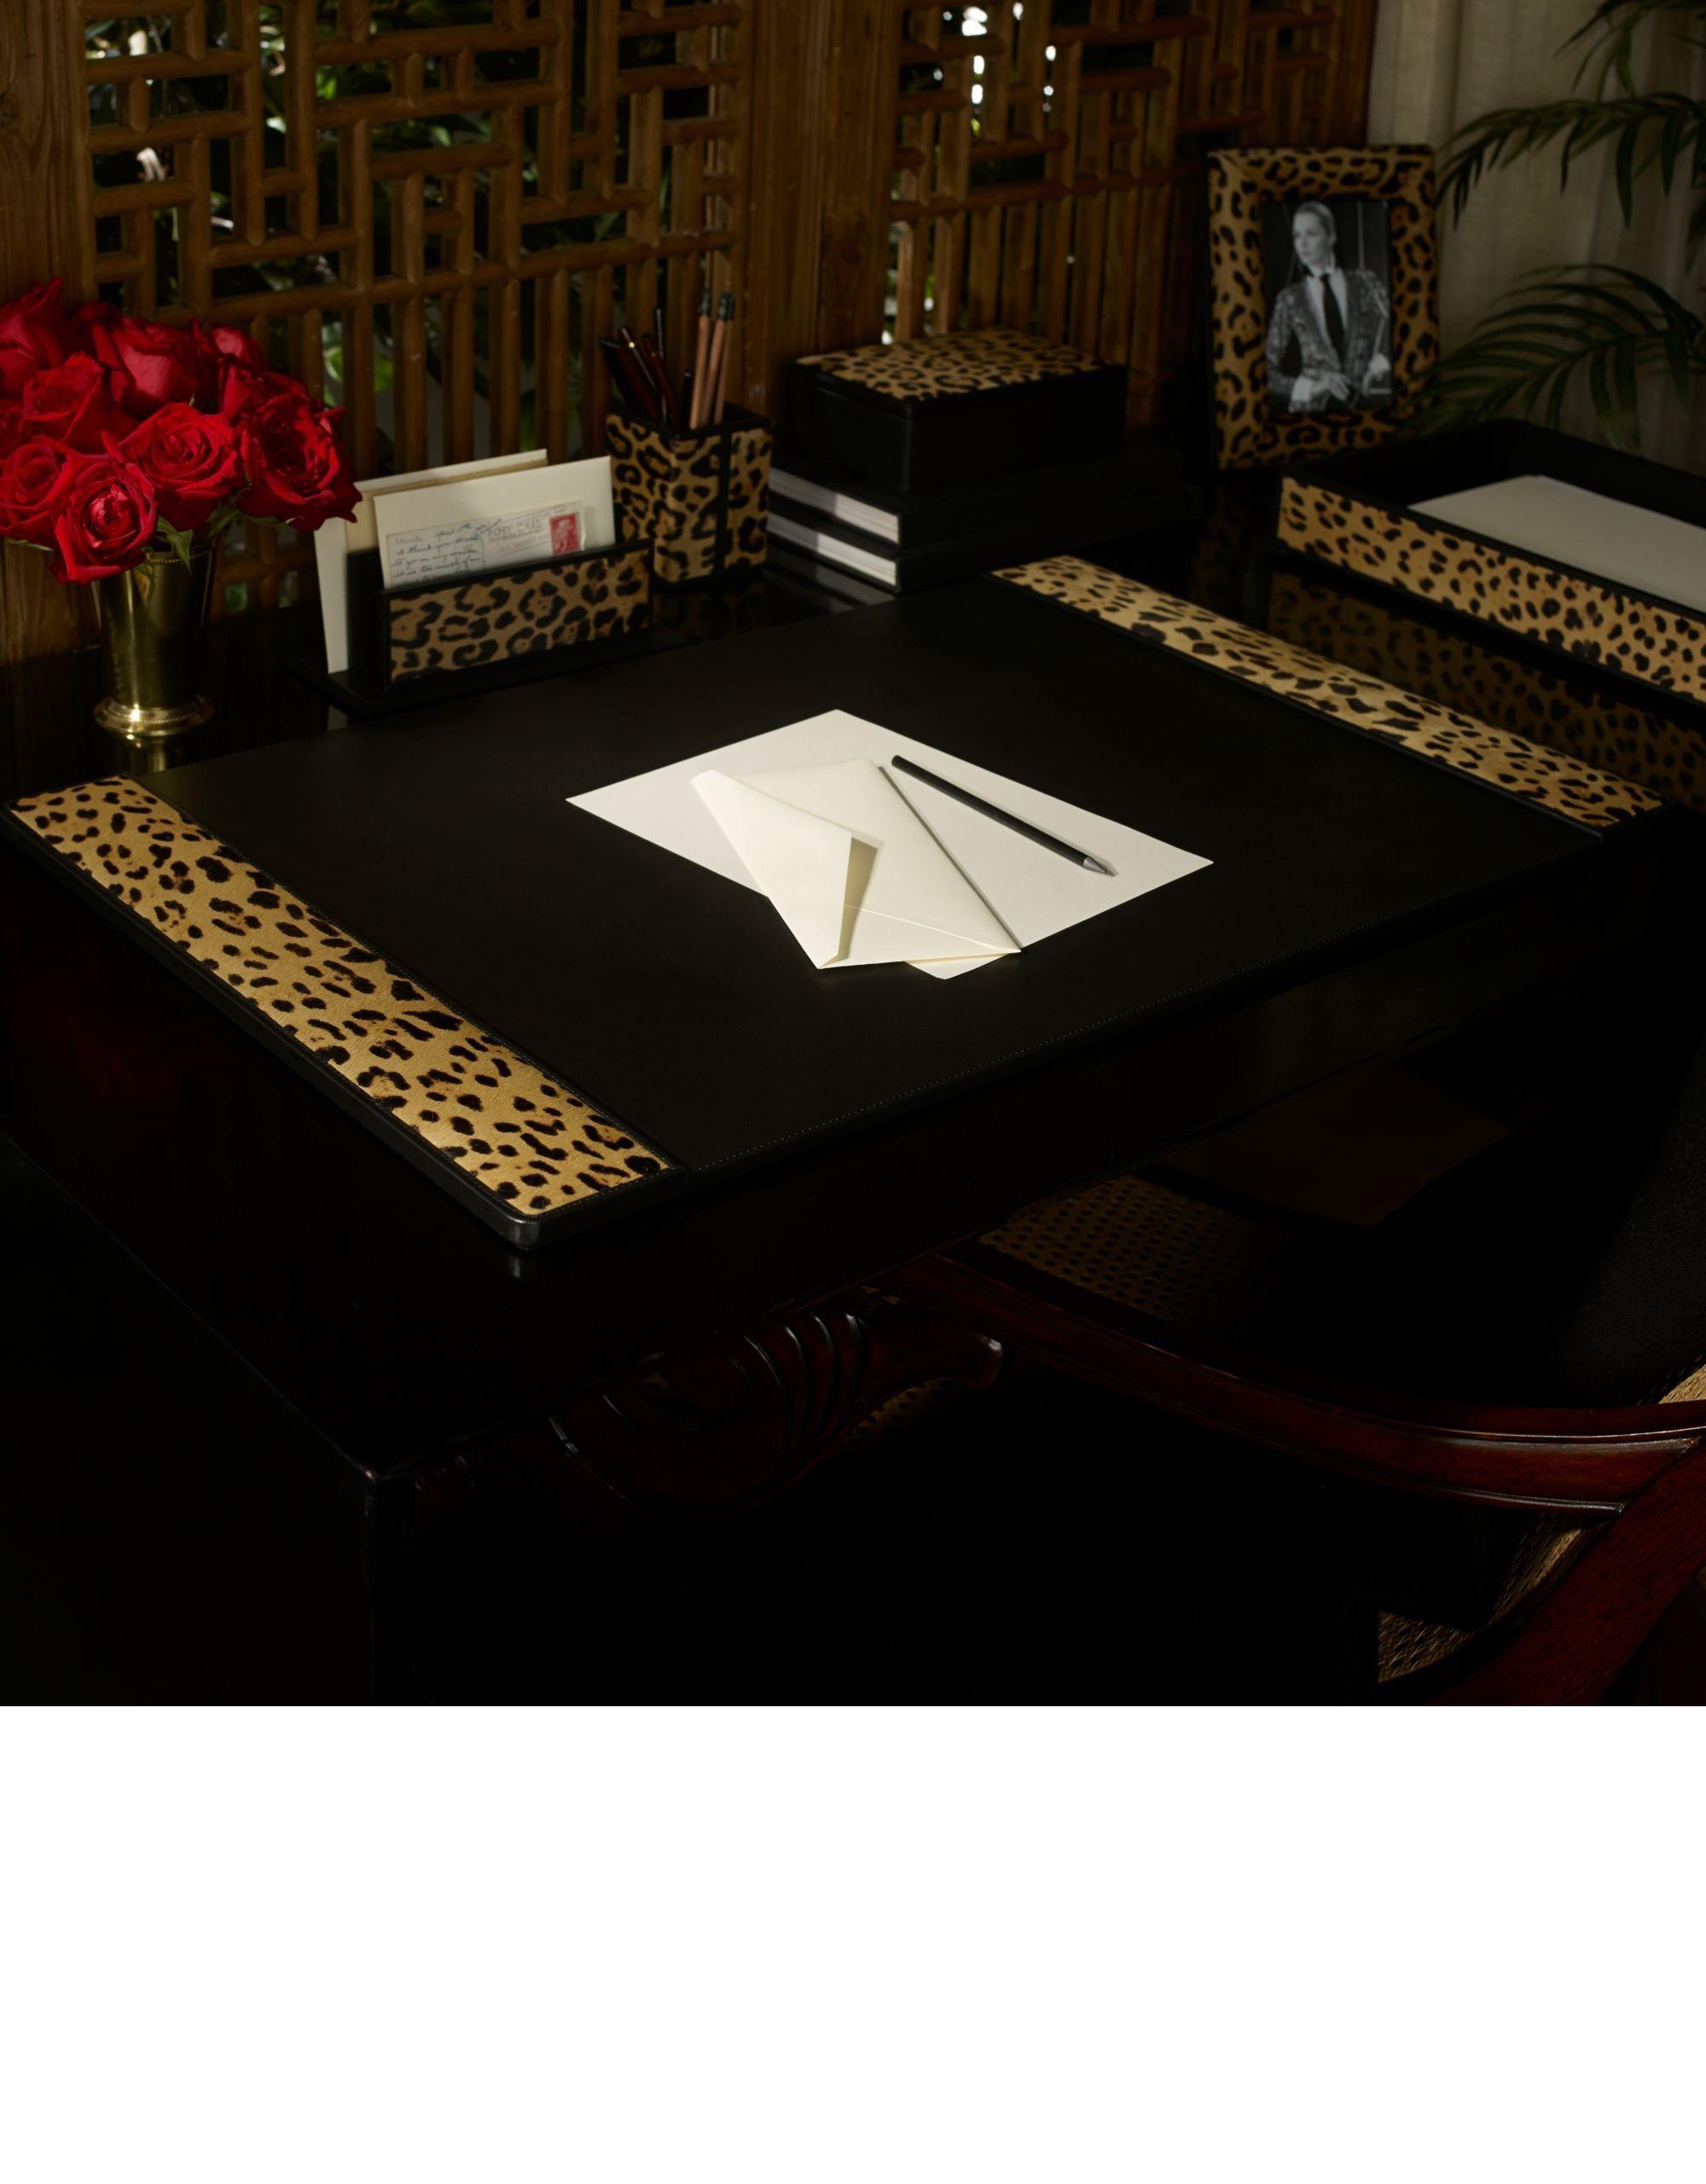 ralph lauren luxury desk accessories animal print decor. Black Bedroom Furniture Sets. Home Design Ideas